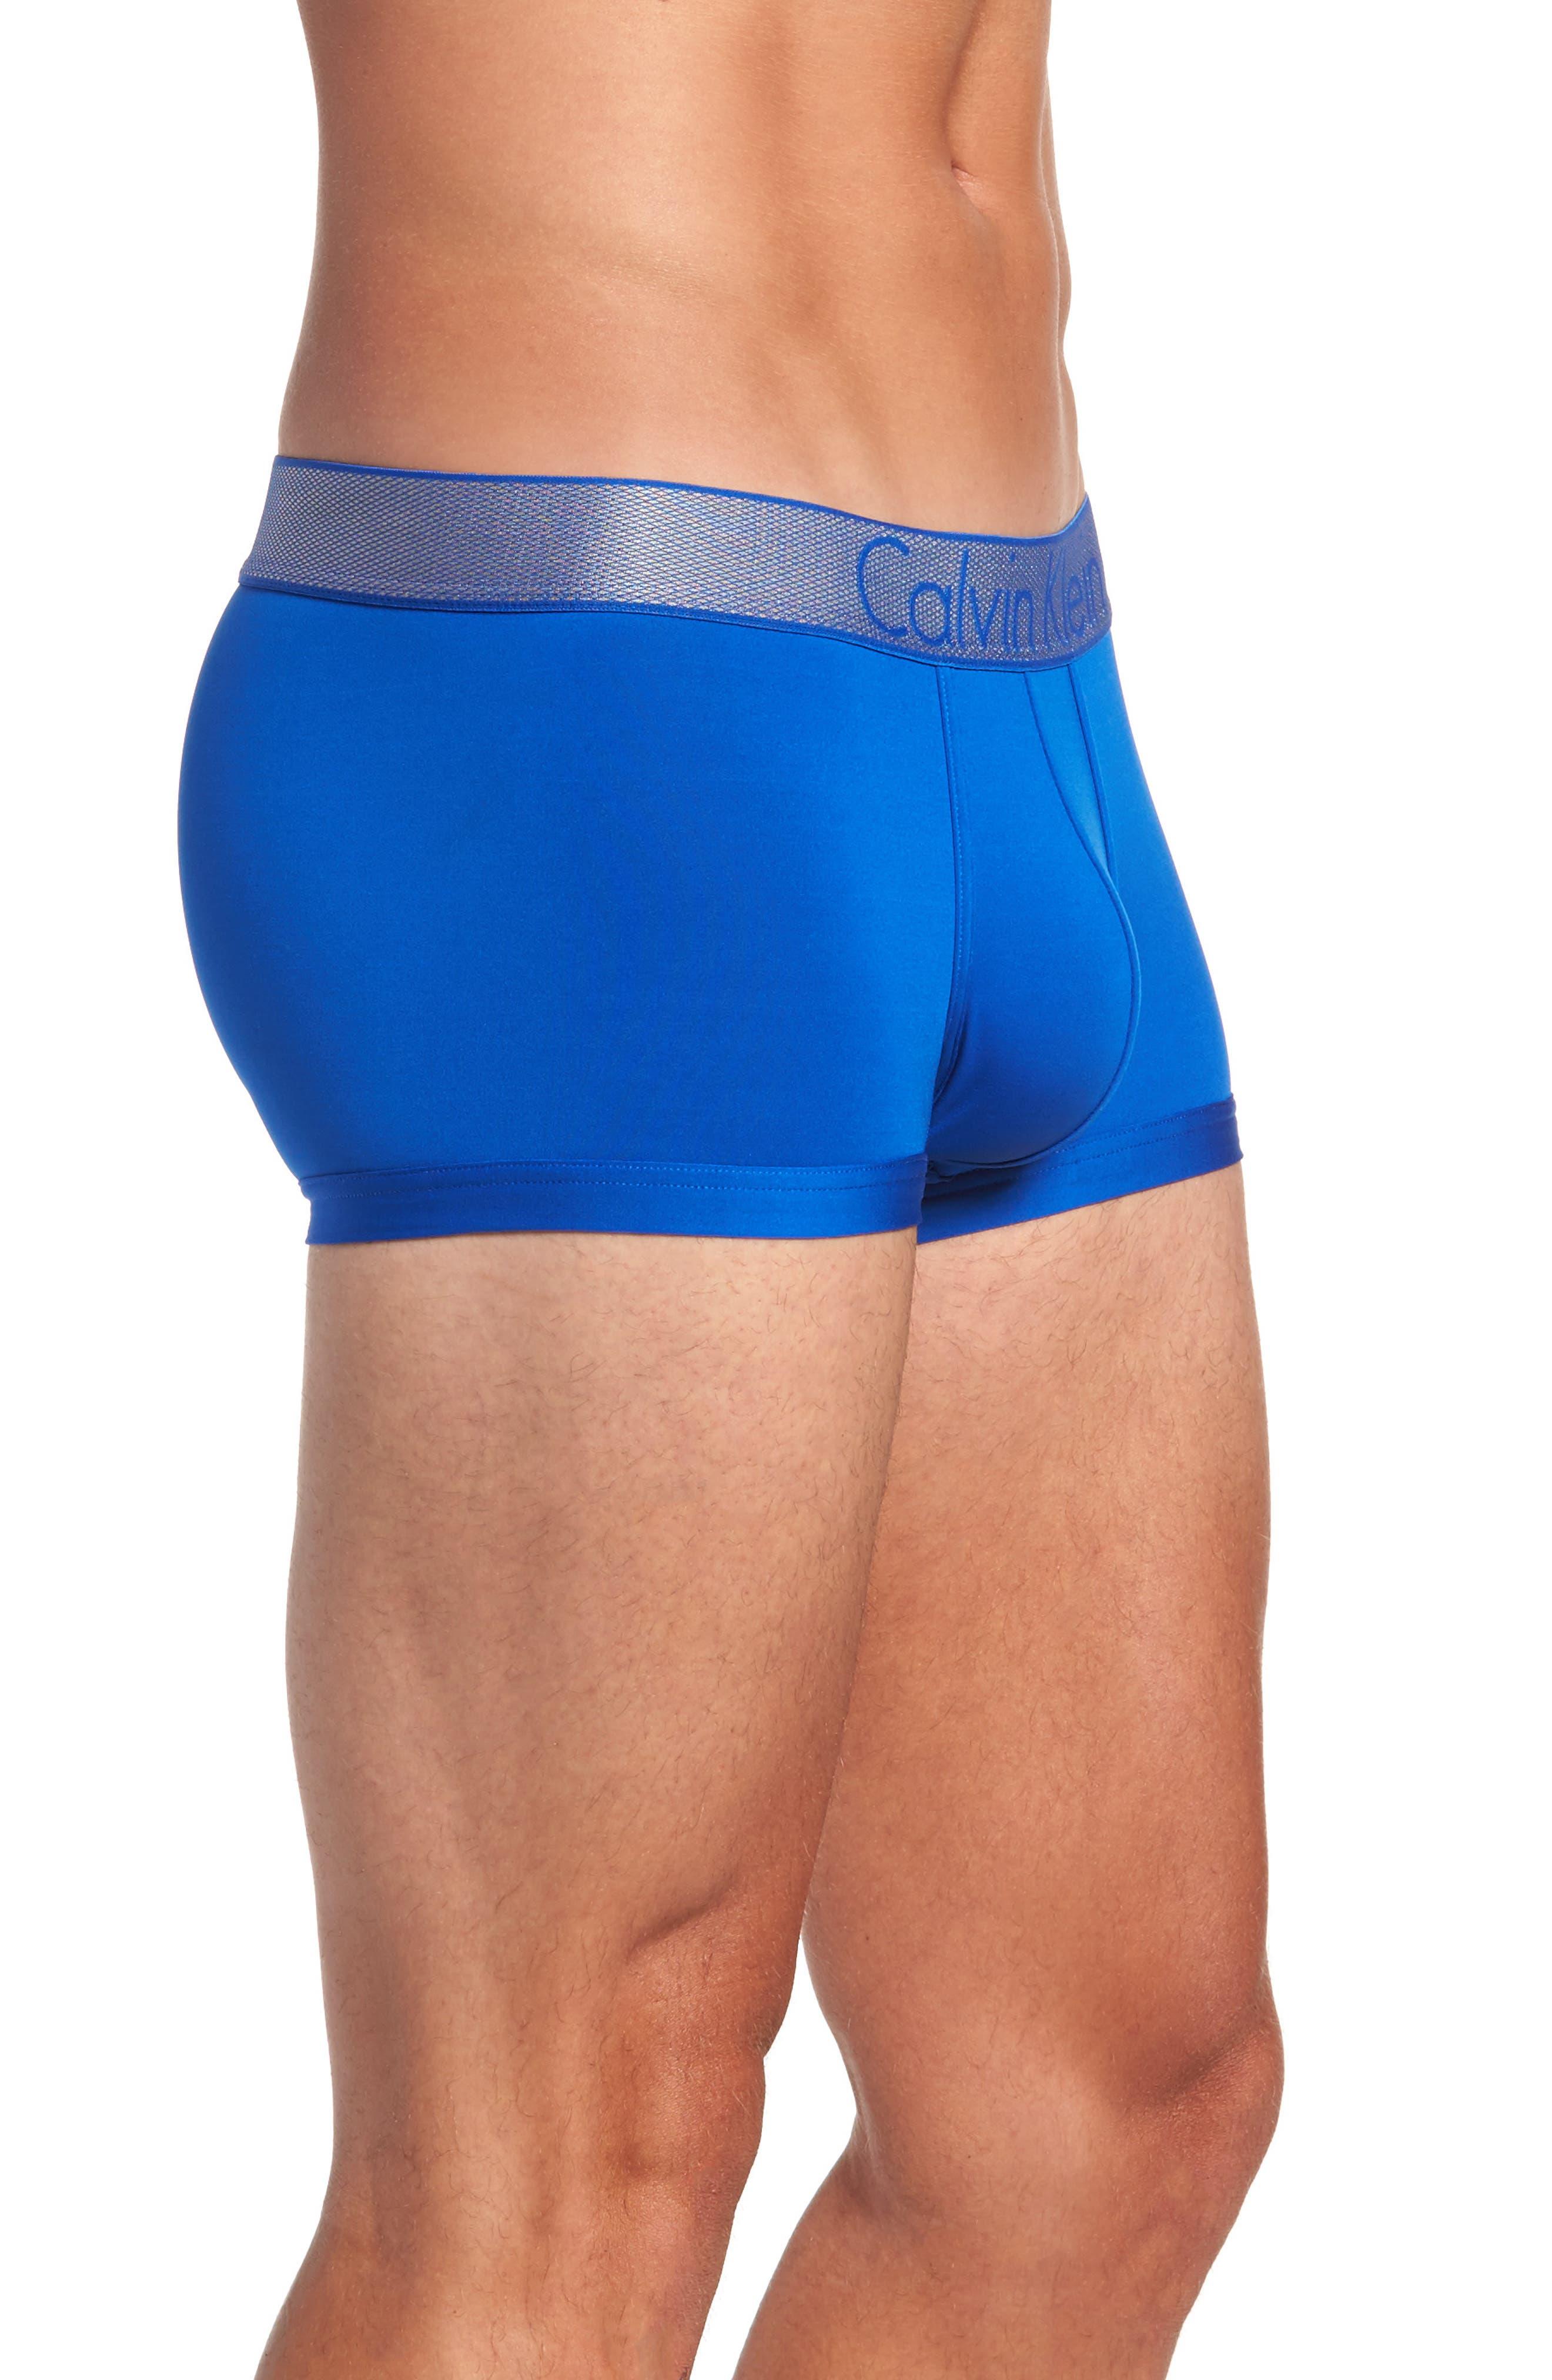 Alternate Image 3  - Calvin Klein Customized Stretch Low Rise Trunks